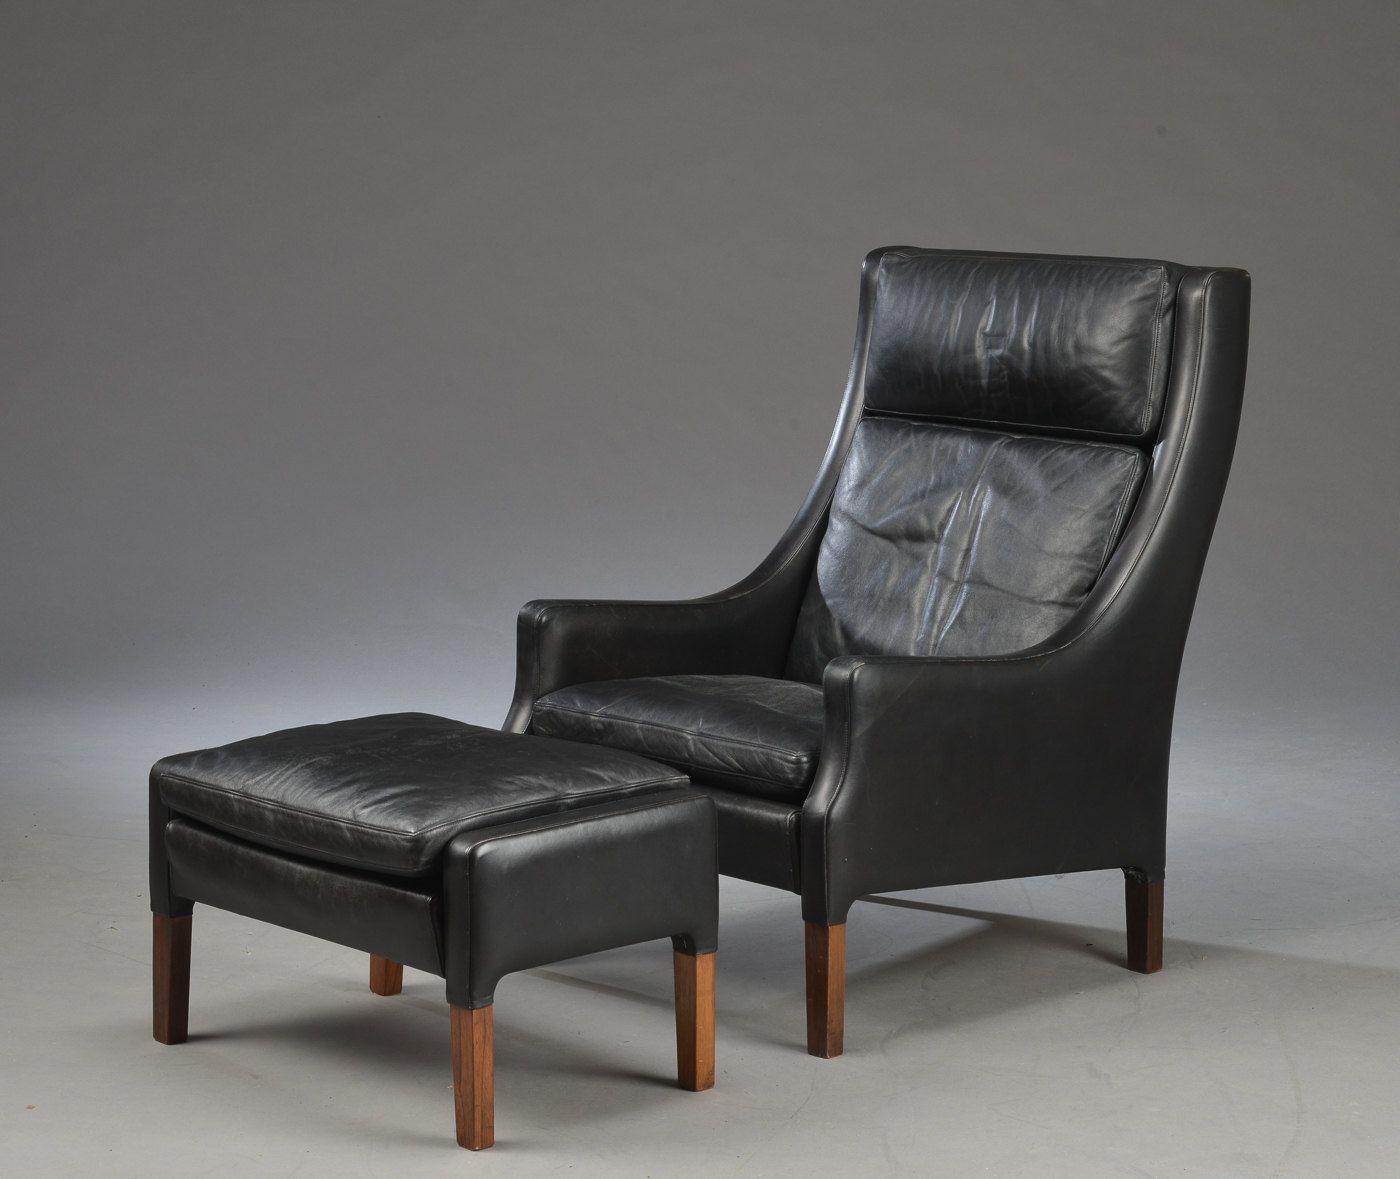 Wonderful Danish Black Leather Armchair Easychair Lounge Chair